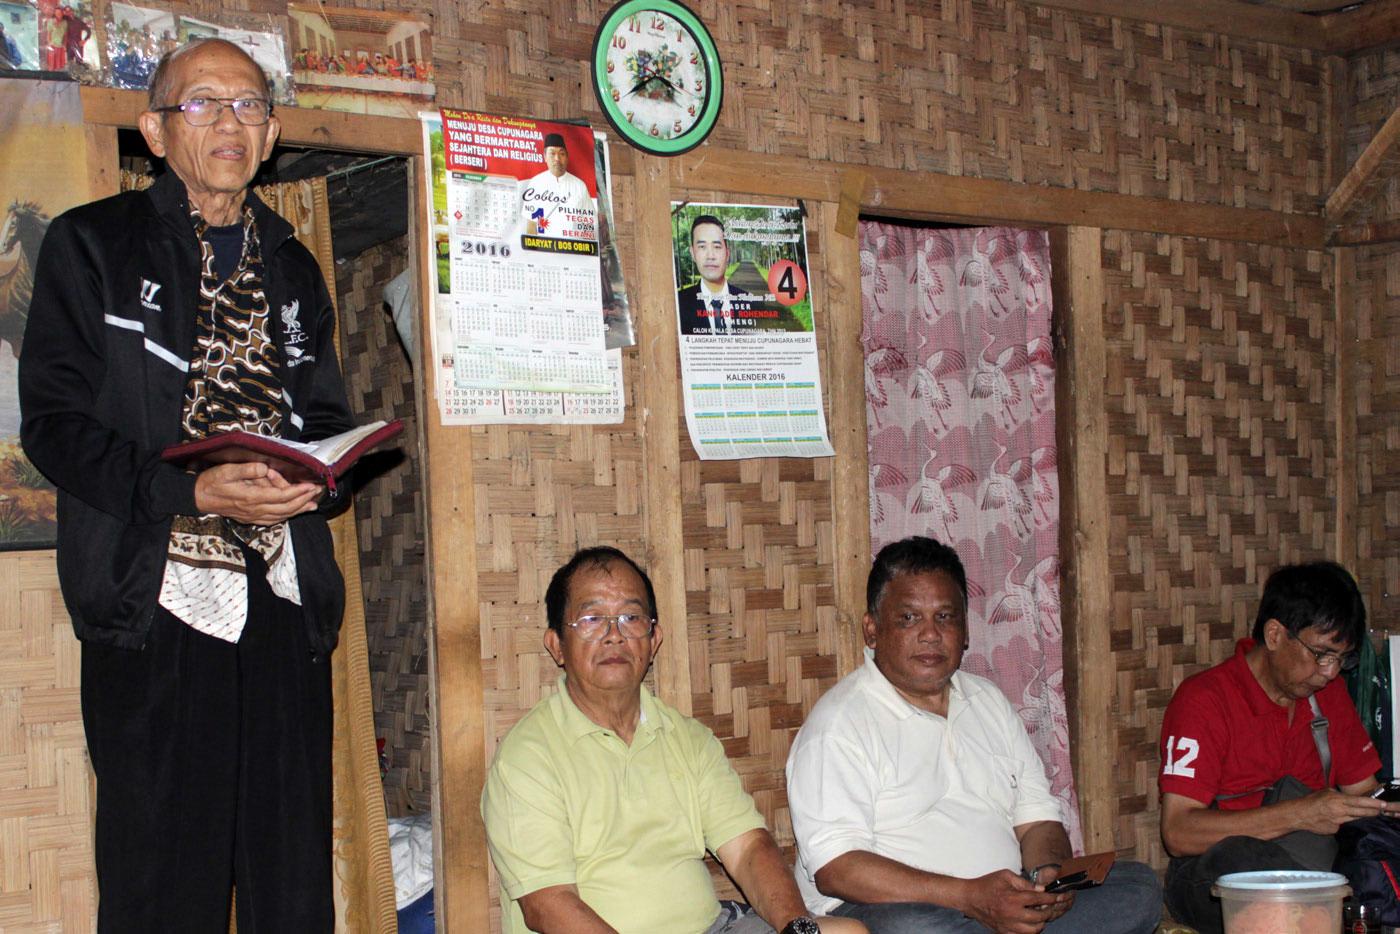 Penatua Wiranto Sudarmono menyapa warga pos lewat Firman Tuhan